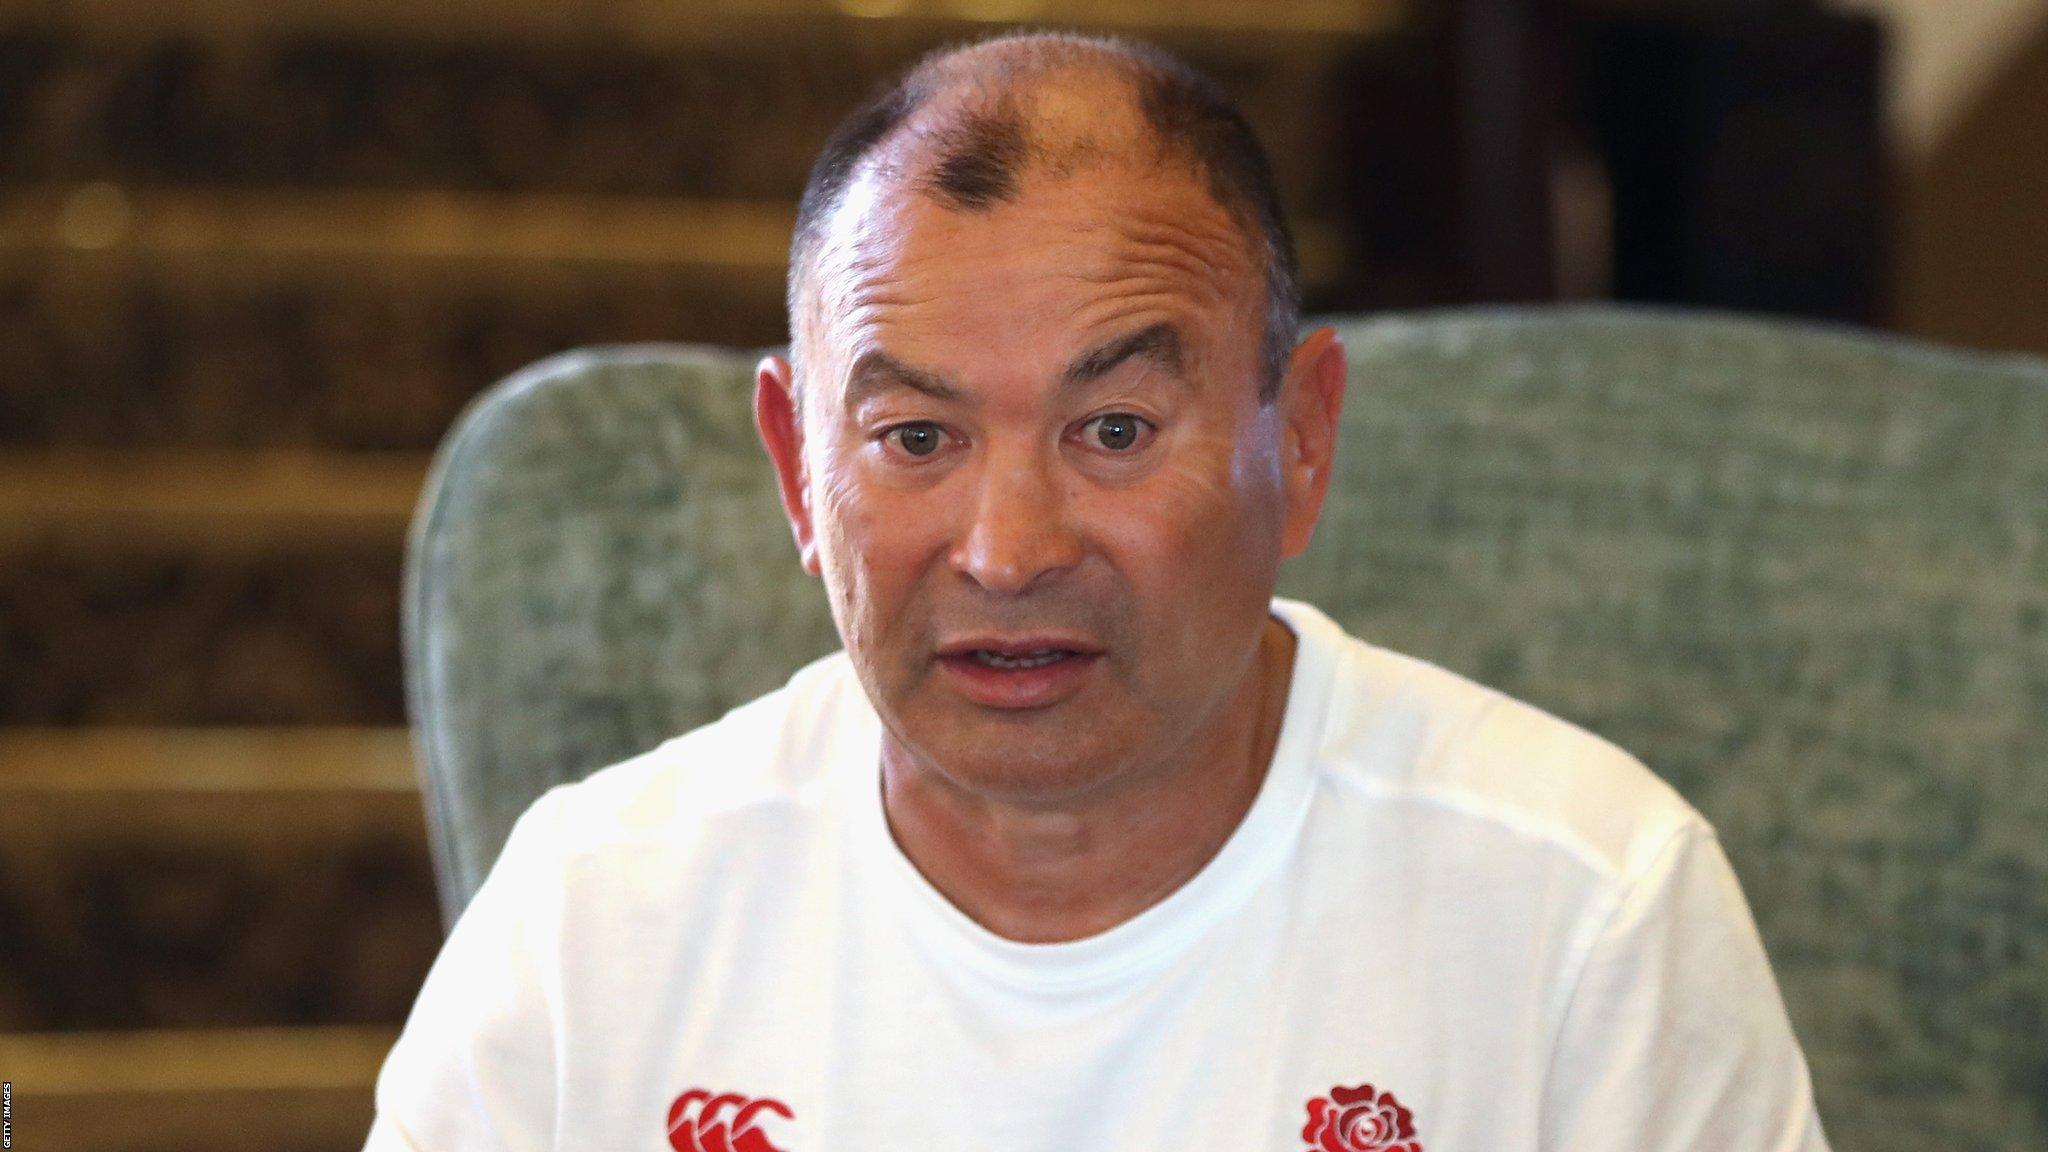 England head coach Jones has 'no concerns' over future